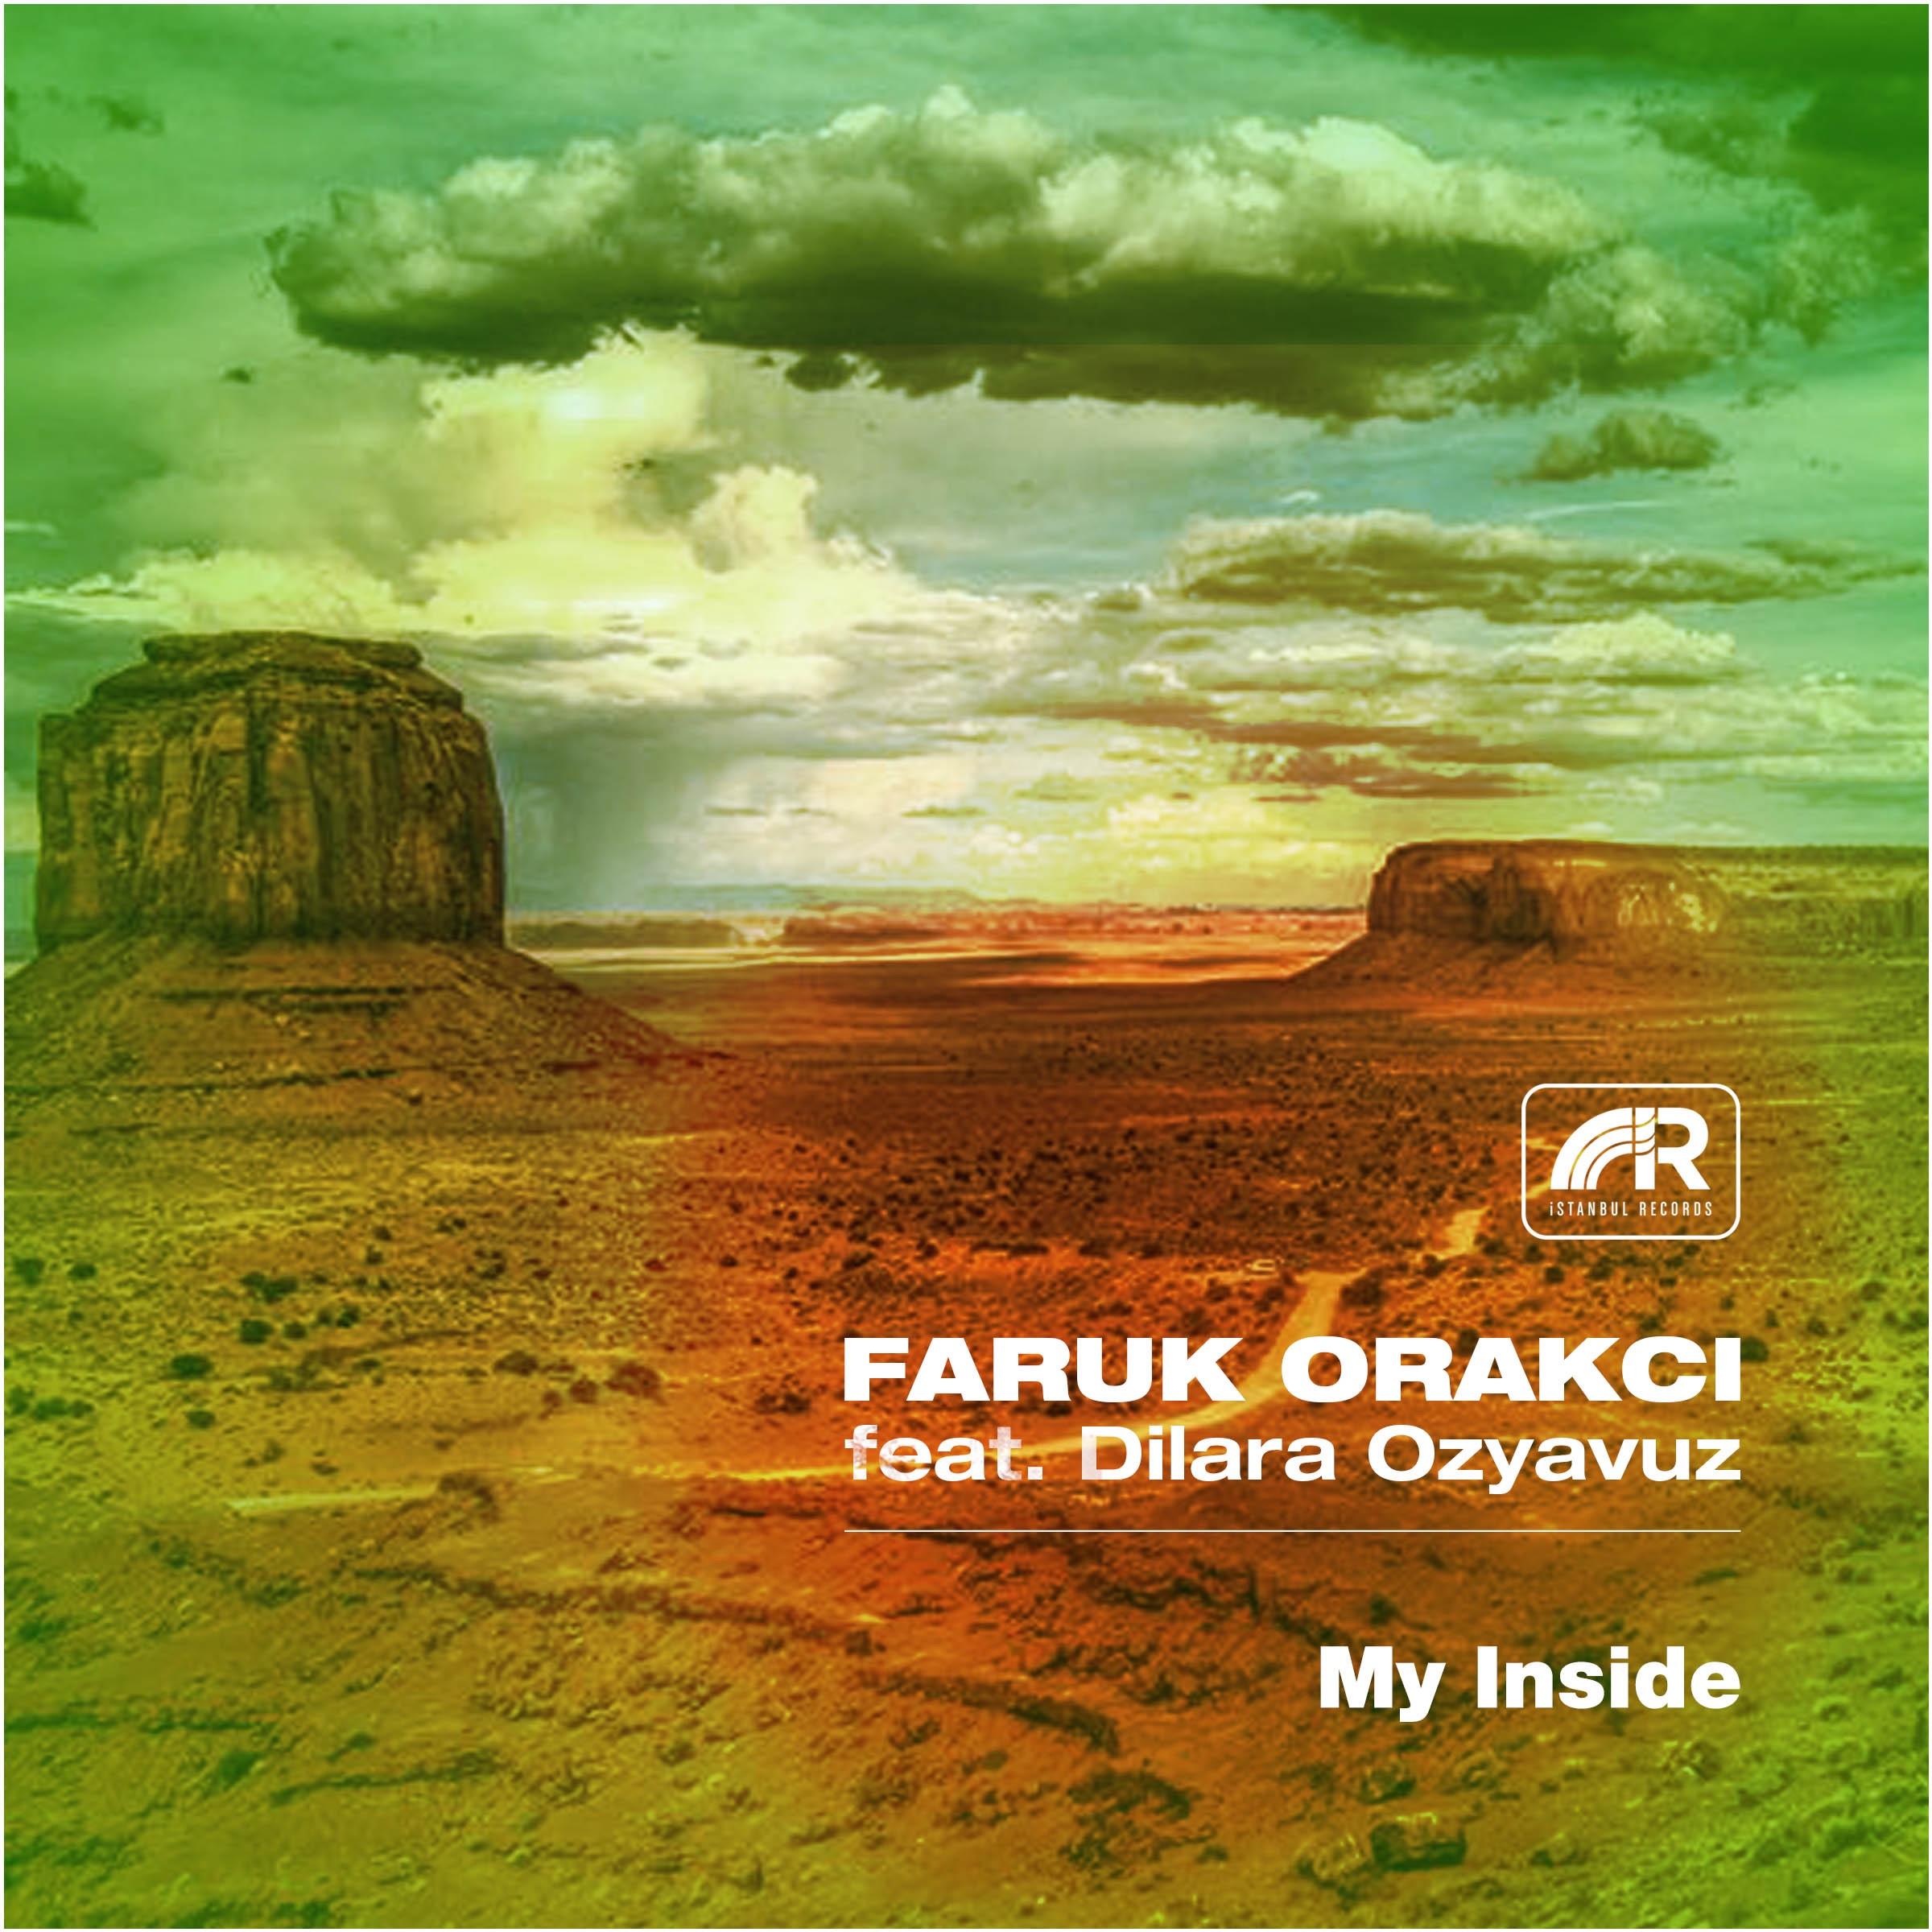 My Inside (feat. Dilara Ozyavuz) - Single